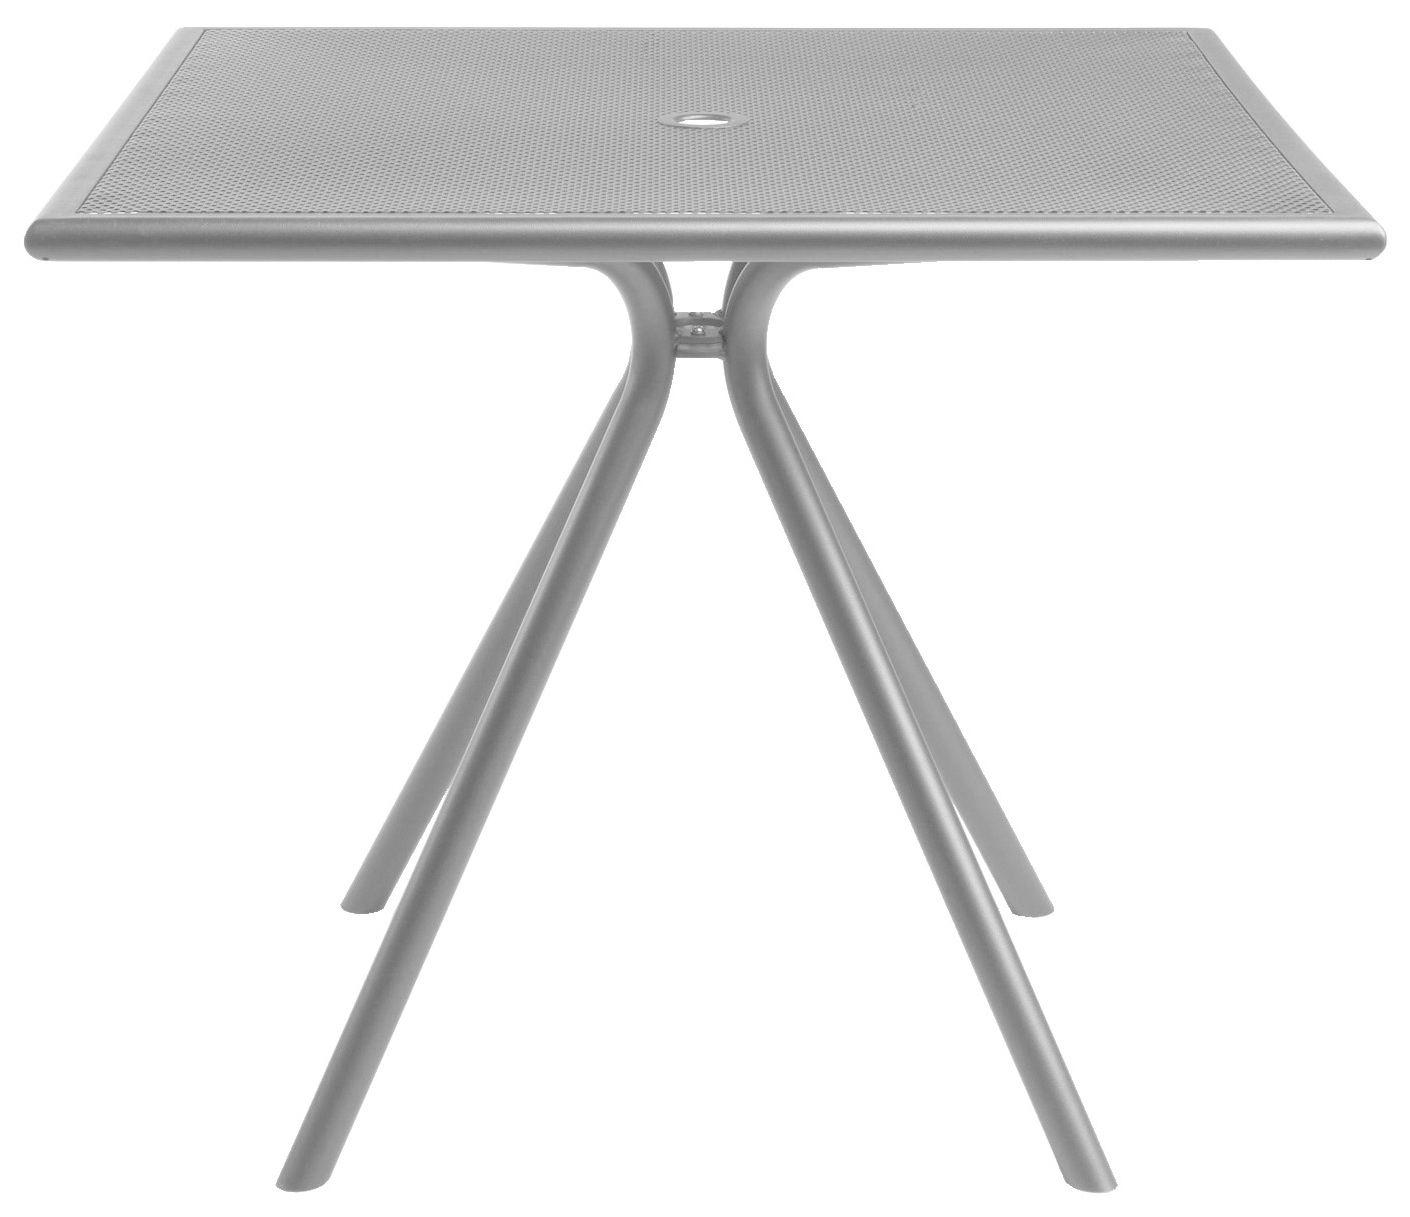 Table De Jardin Solid 80 X 80 Cm Aluminium Emu